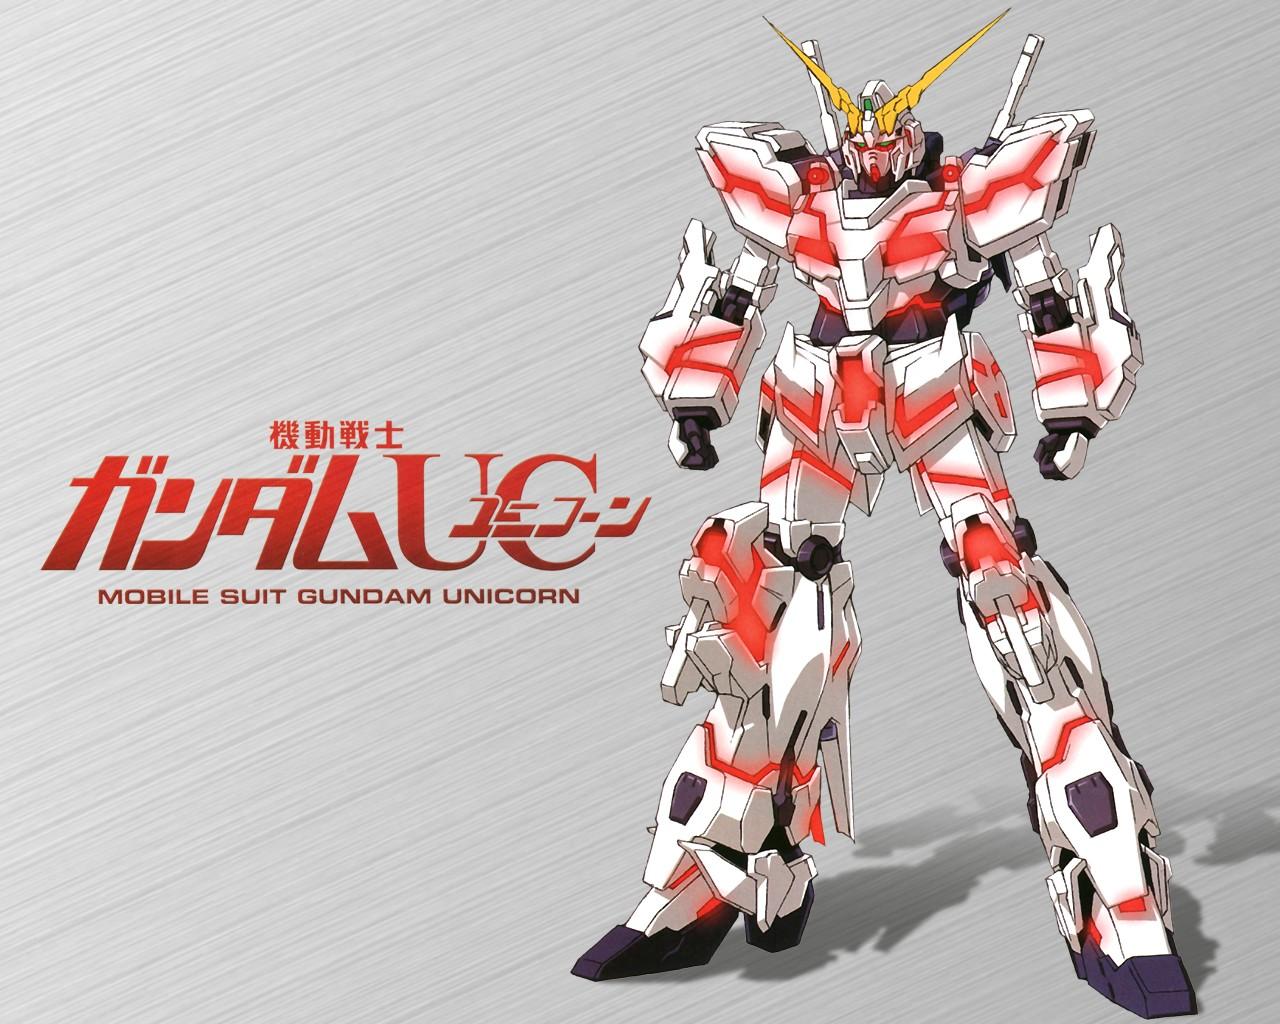 Unicorn pictures 40 high quality unicorn wallpapers full hd unicorn - Gundam Unicorn Wallpaper 1280x1024 Gundam Unicorn